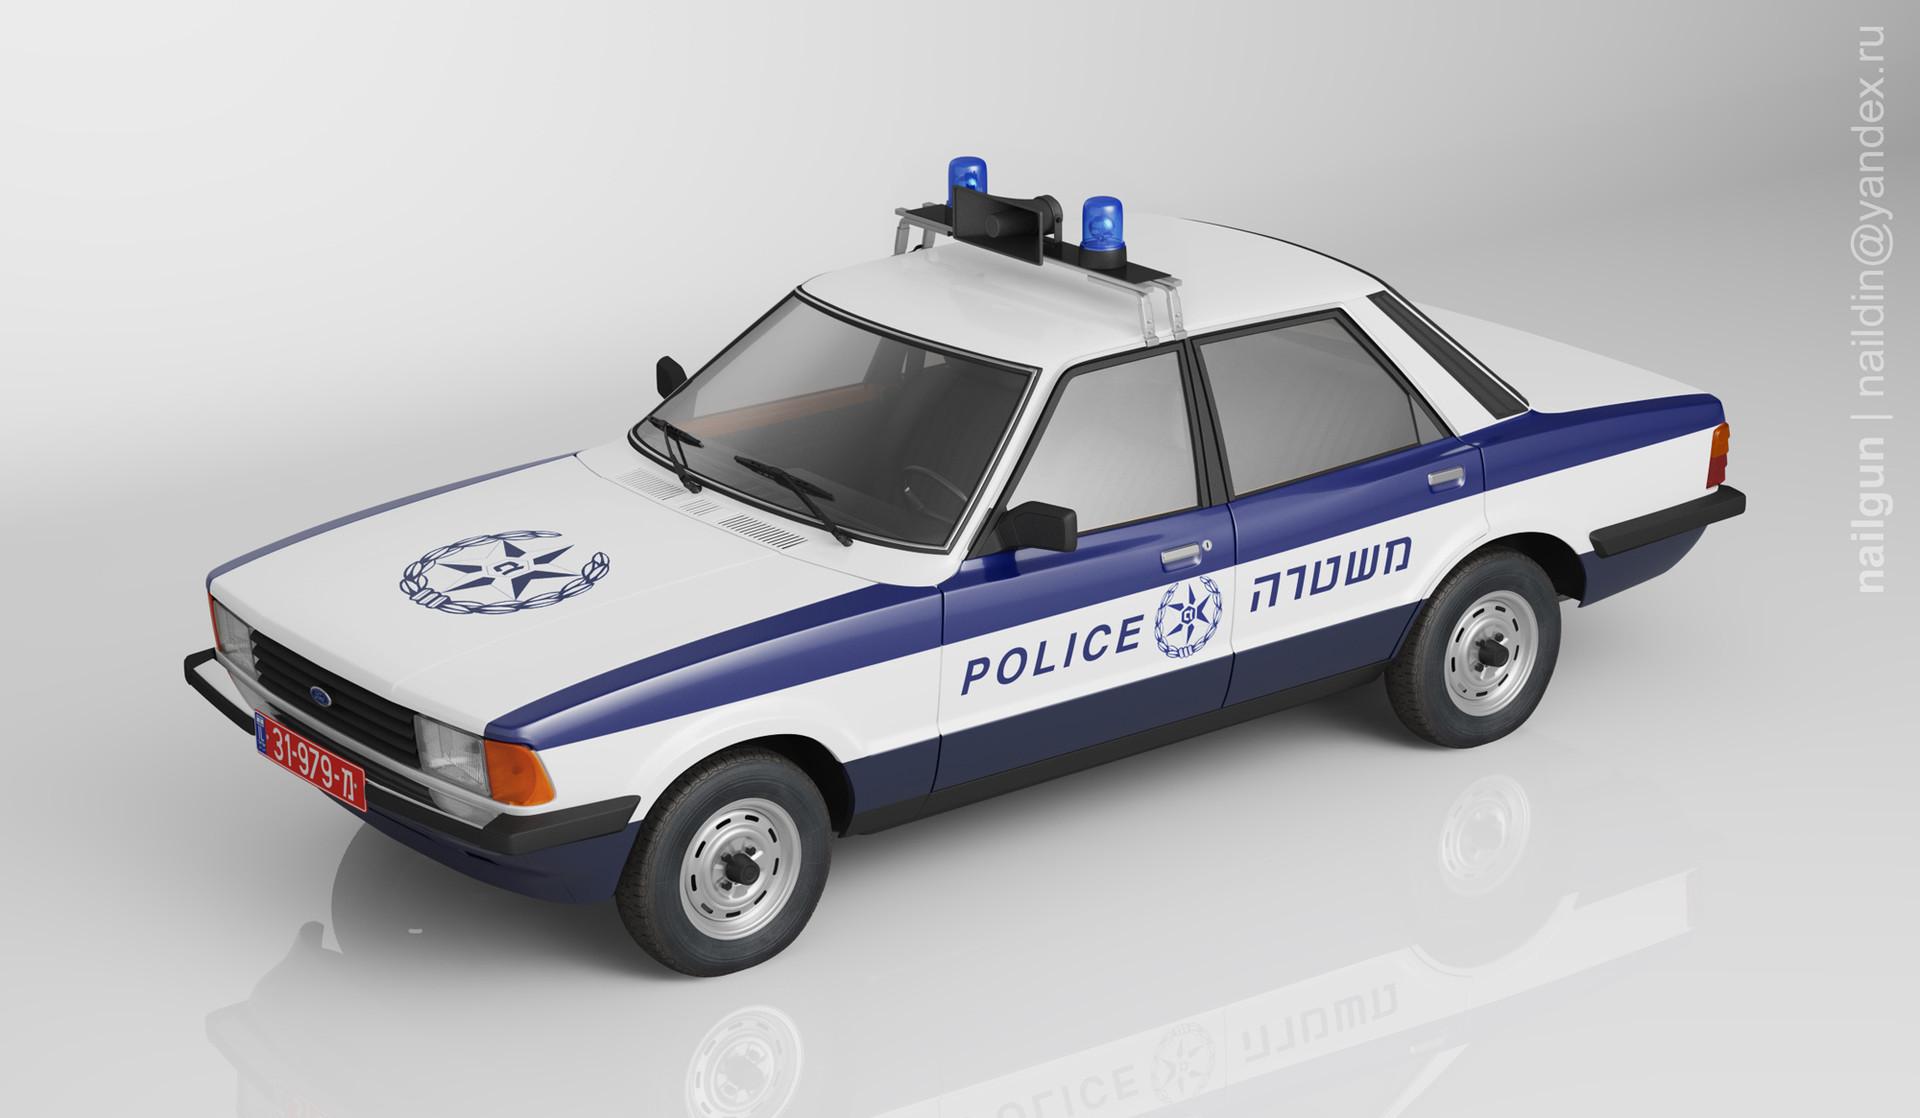 Nail khusnutdinov pwc 031 000 ford taunus miniature 0